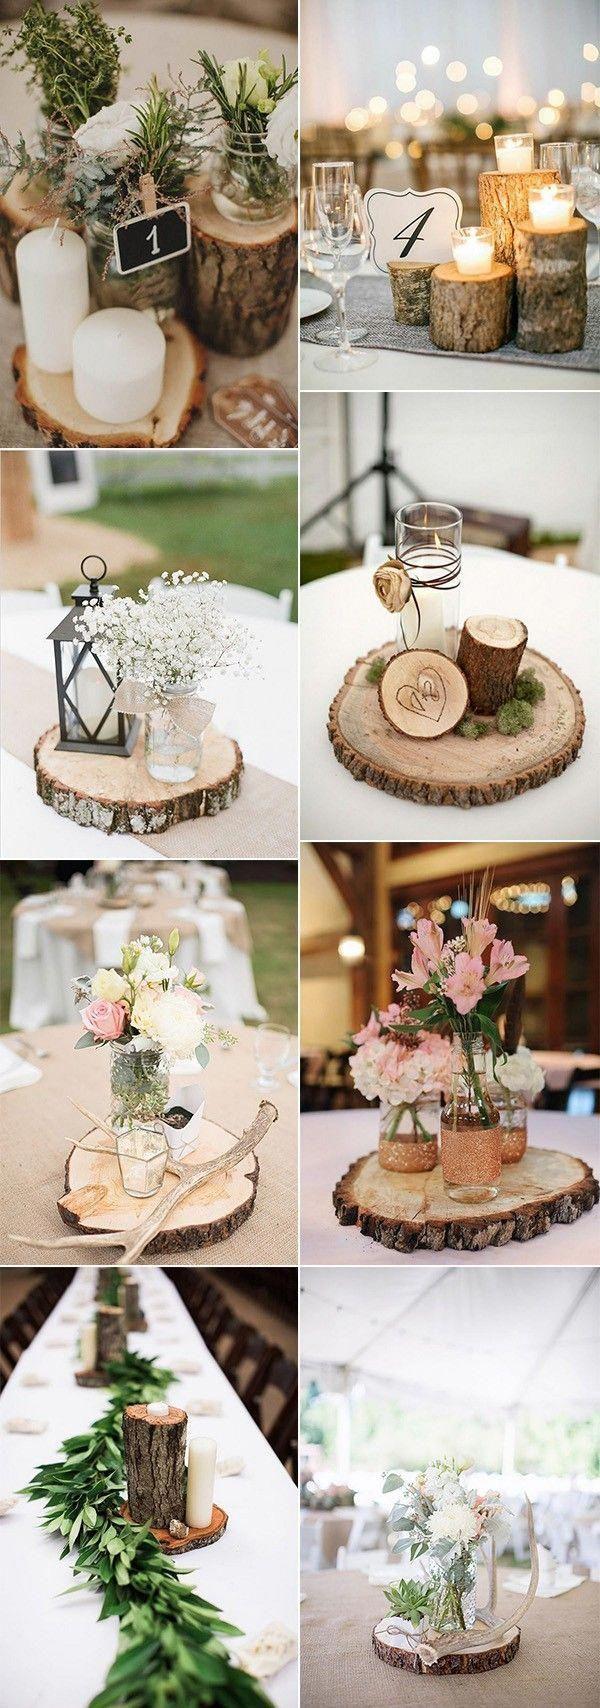 These rustic wedding ideas are really great #rusticweddingideas - #great #Ideas #holzscheibendeko